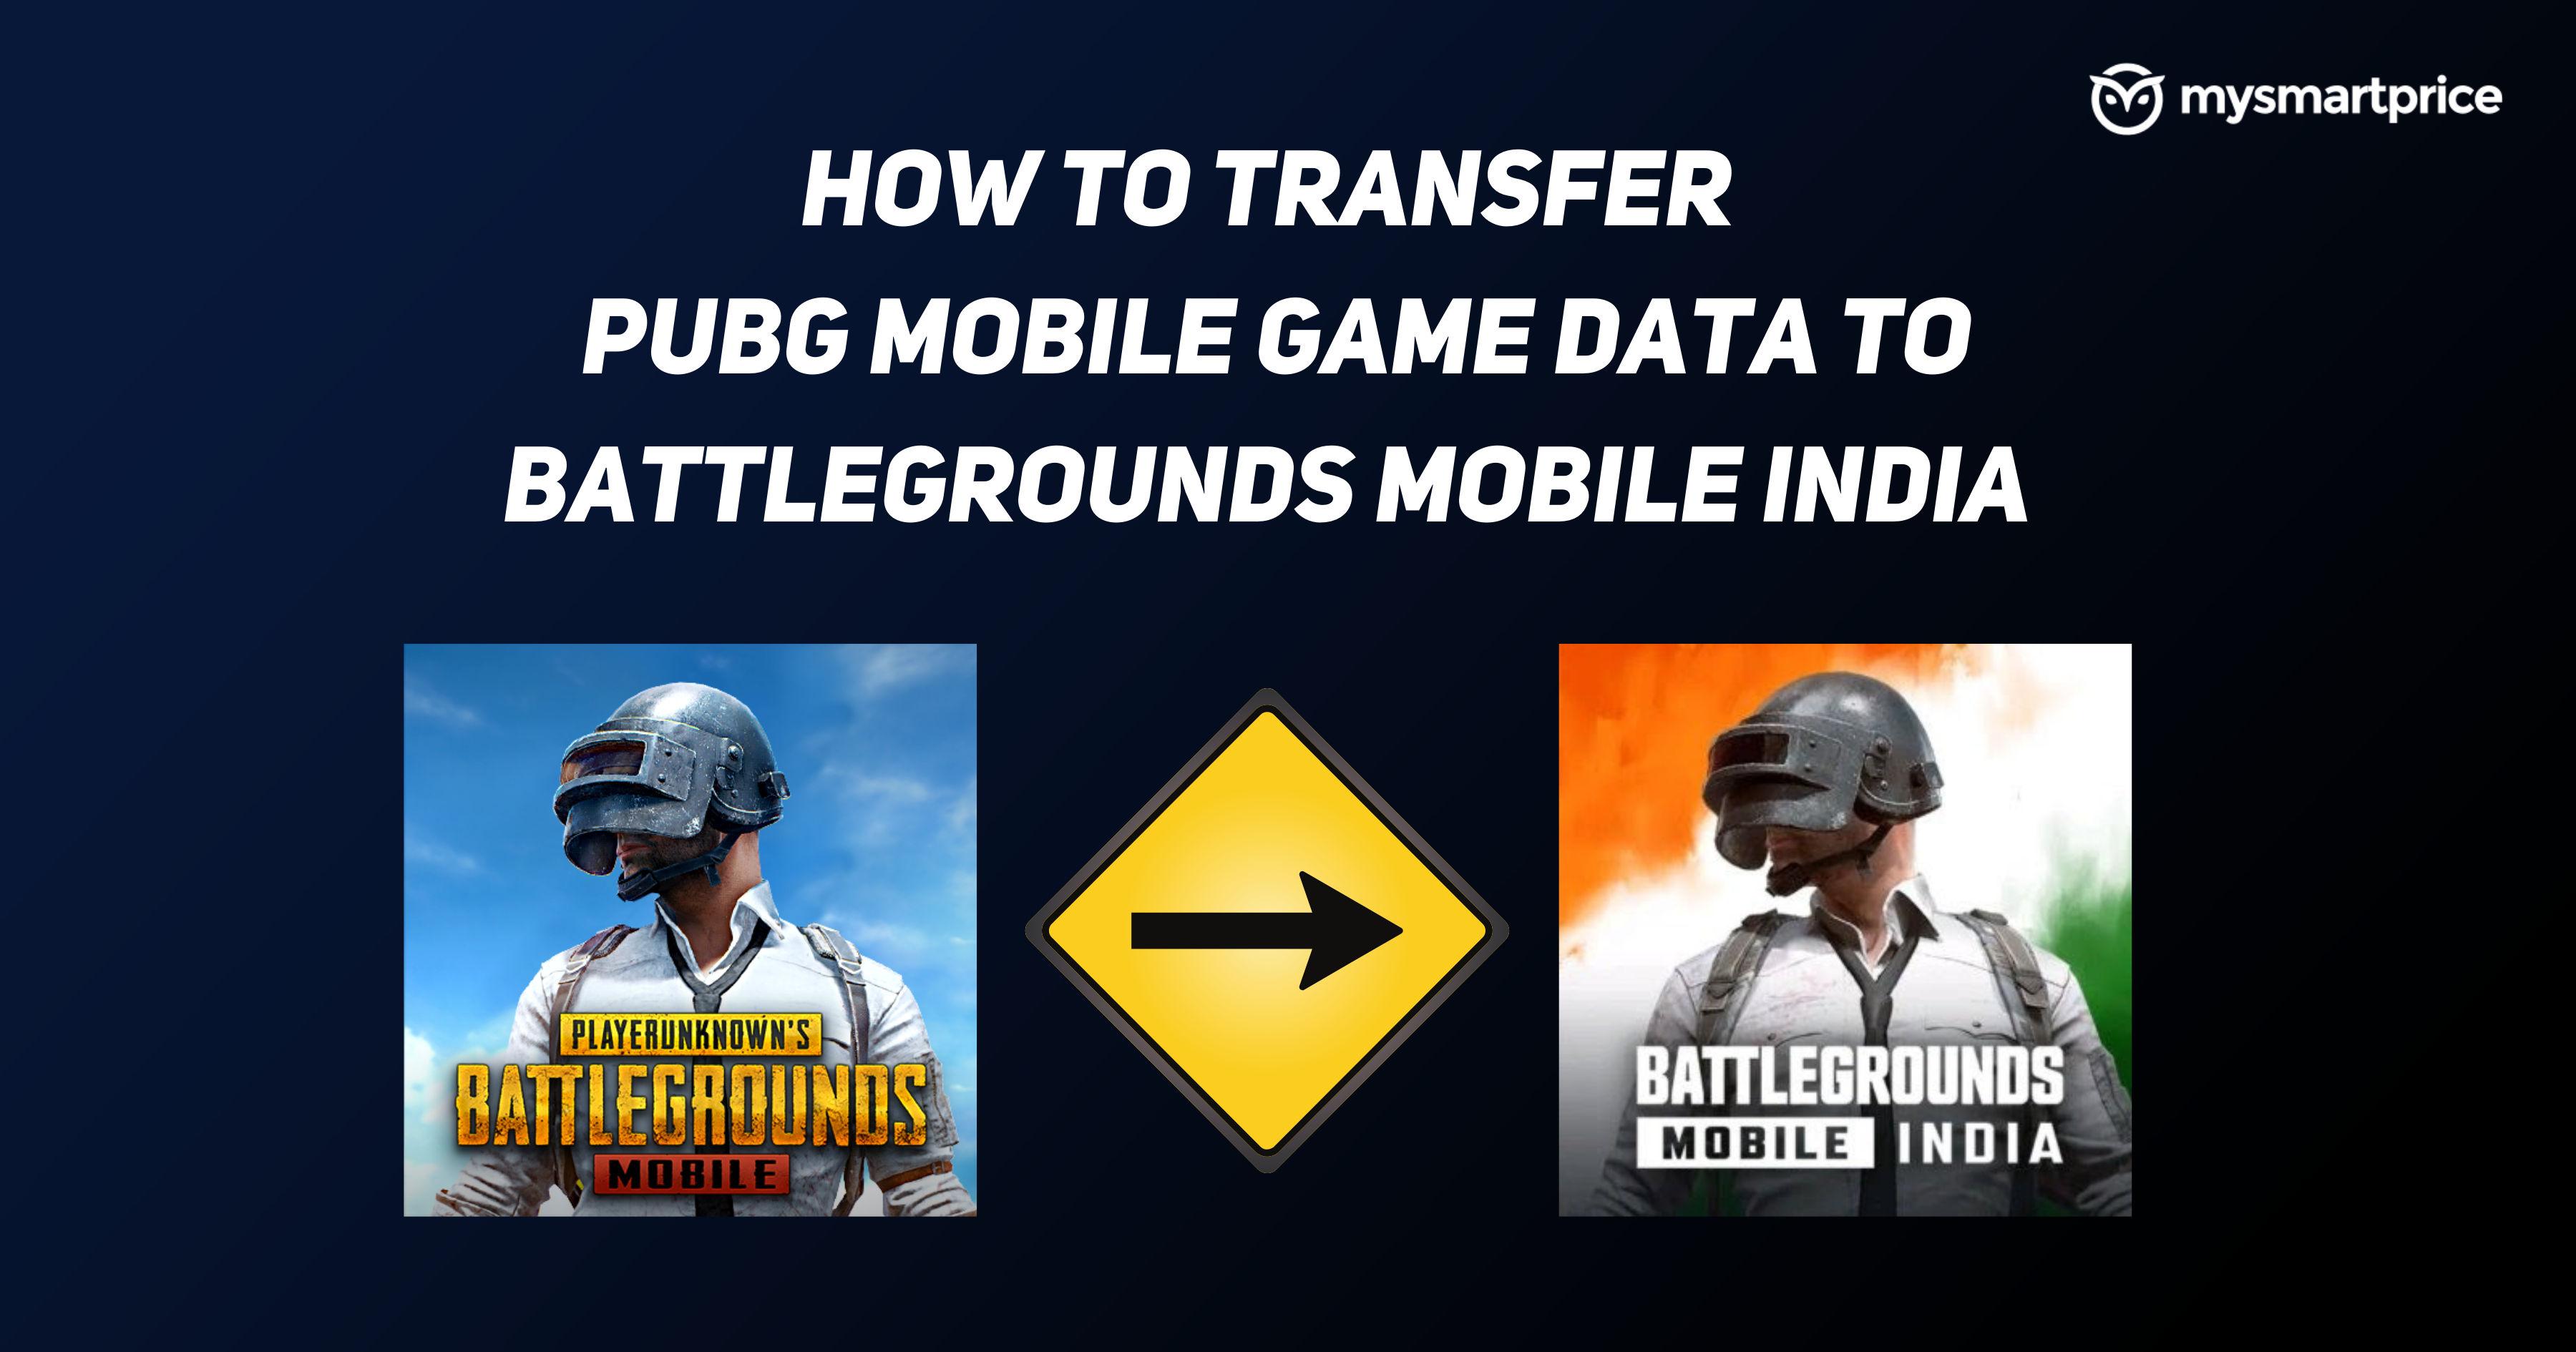 Battlegrounds Mobile India (BGMI): How to Transfer PUBG Mobile Game Data to BGMI via Facebook, Twitter, Google